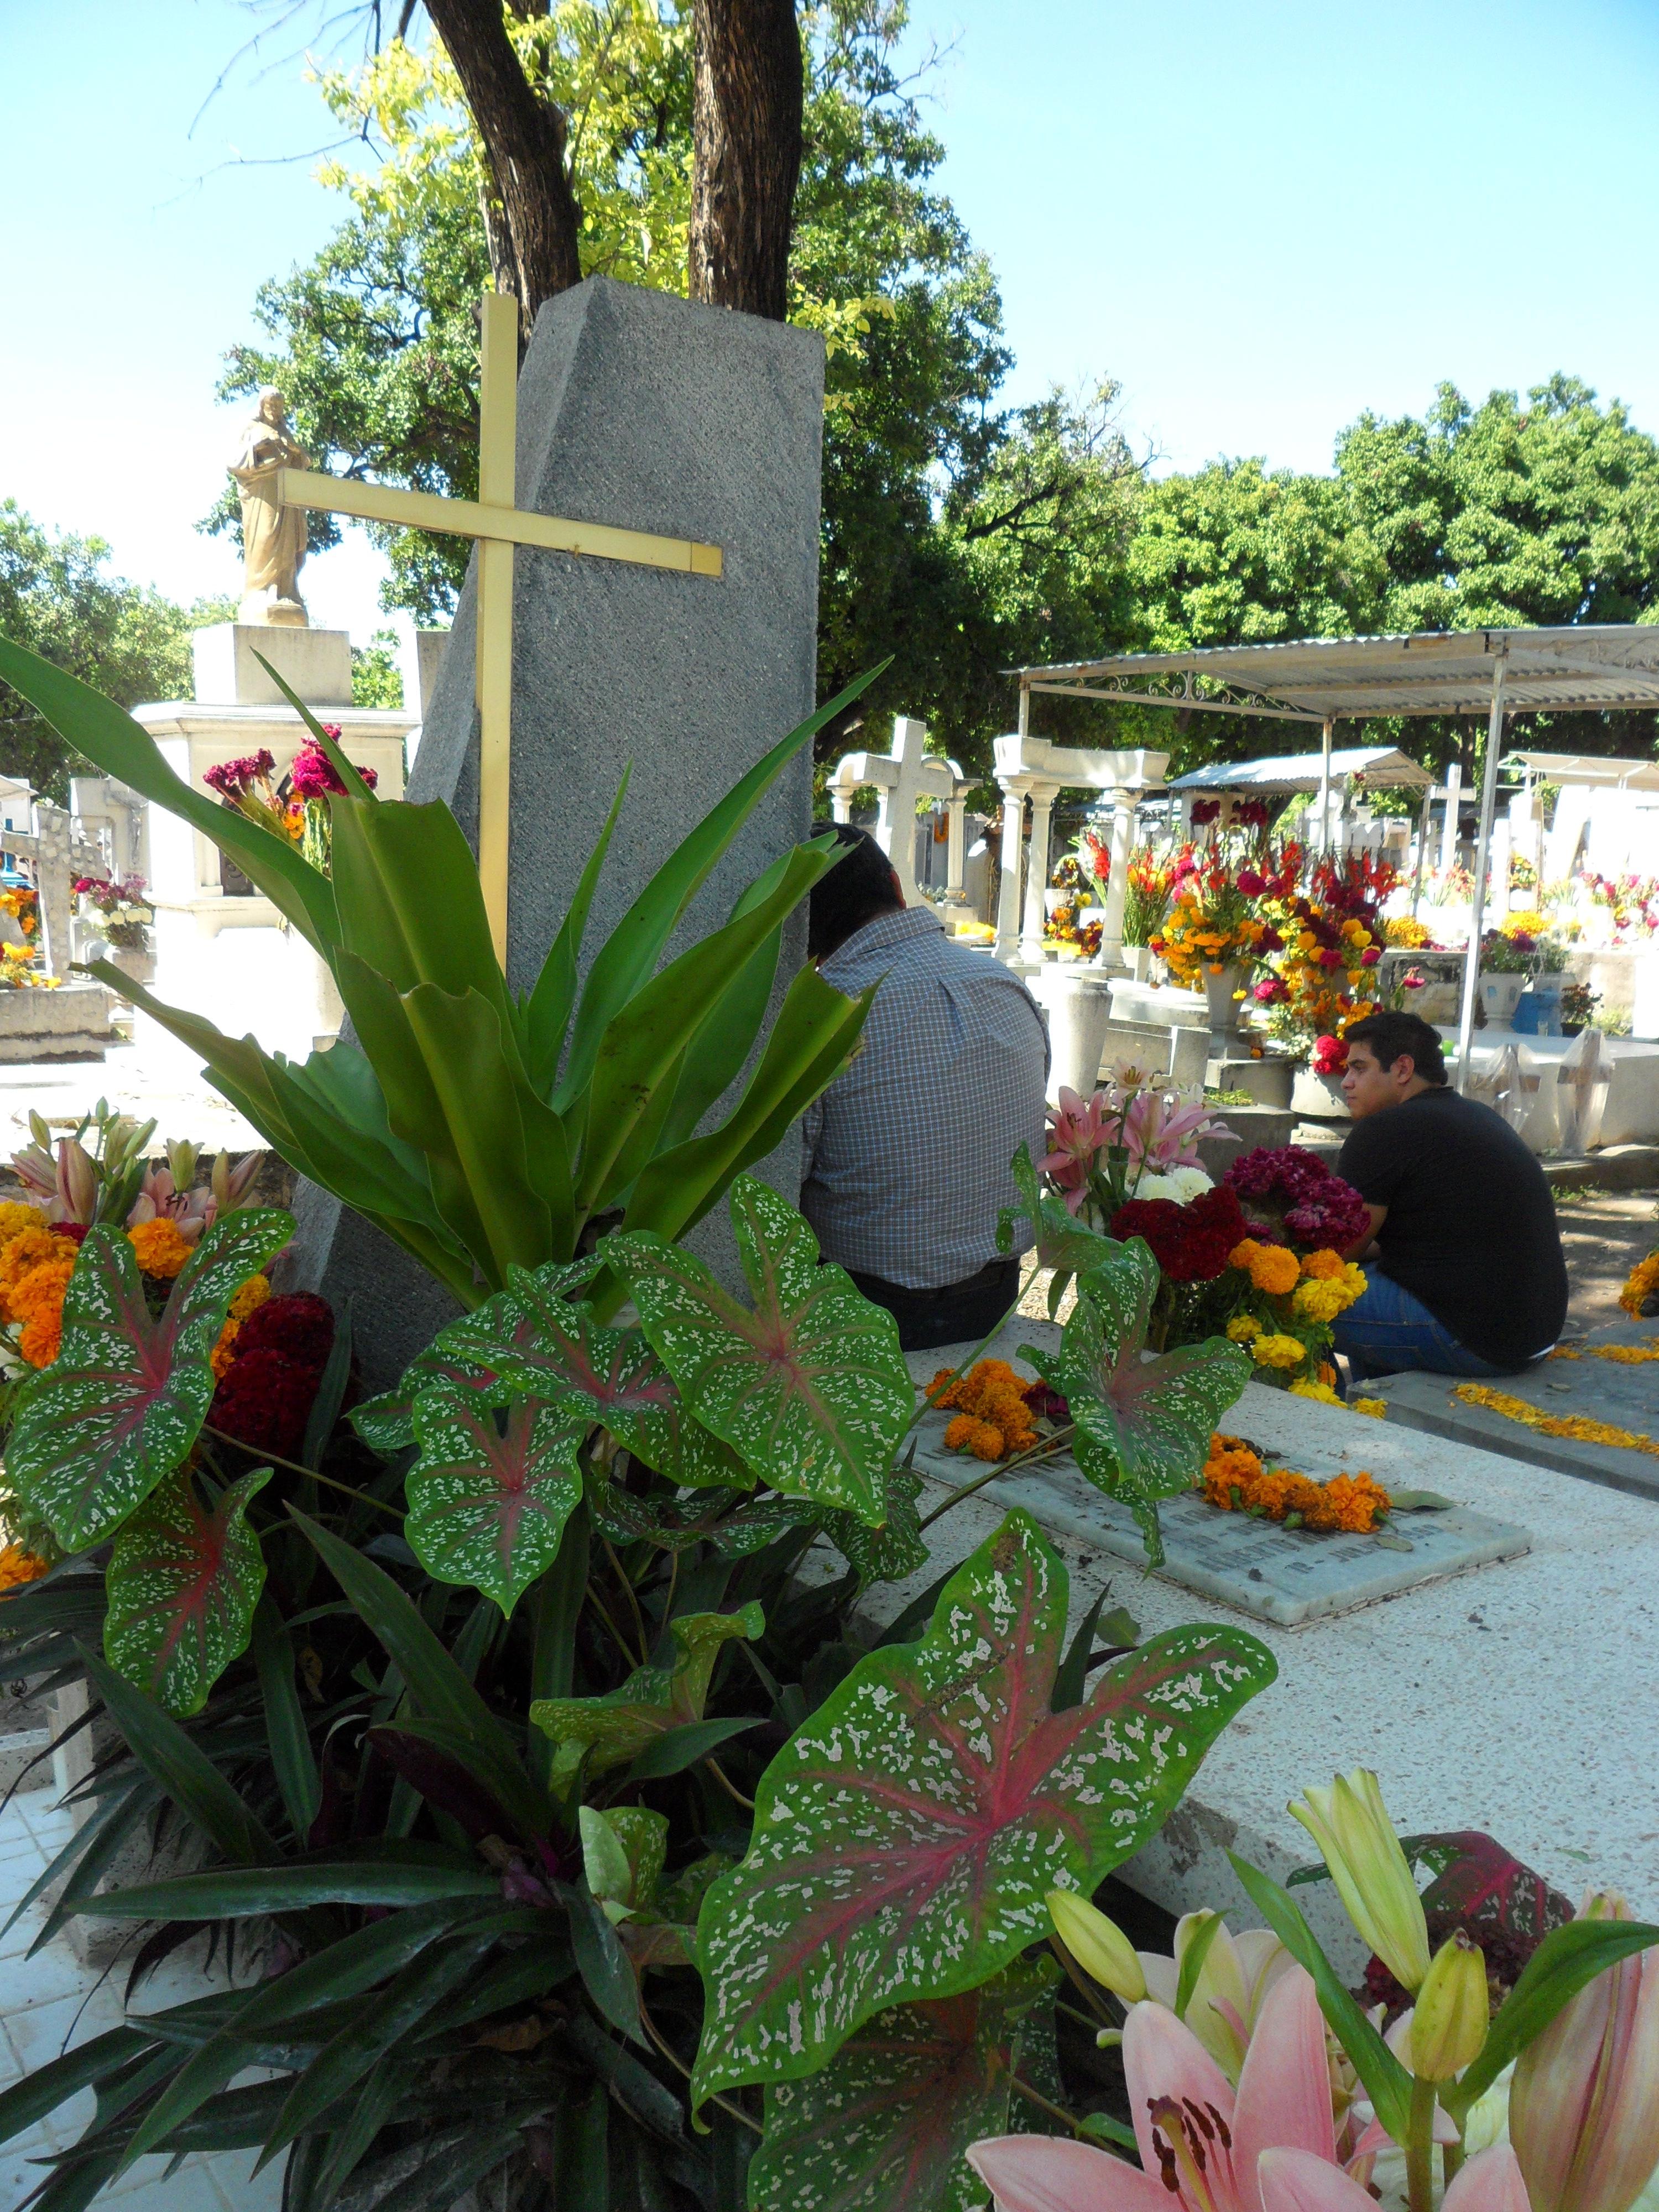 file tumba decorada con plantas ornamentales jpg wikimedia commons. Black Bedroom Furniture Sets. Home Design Ideas